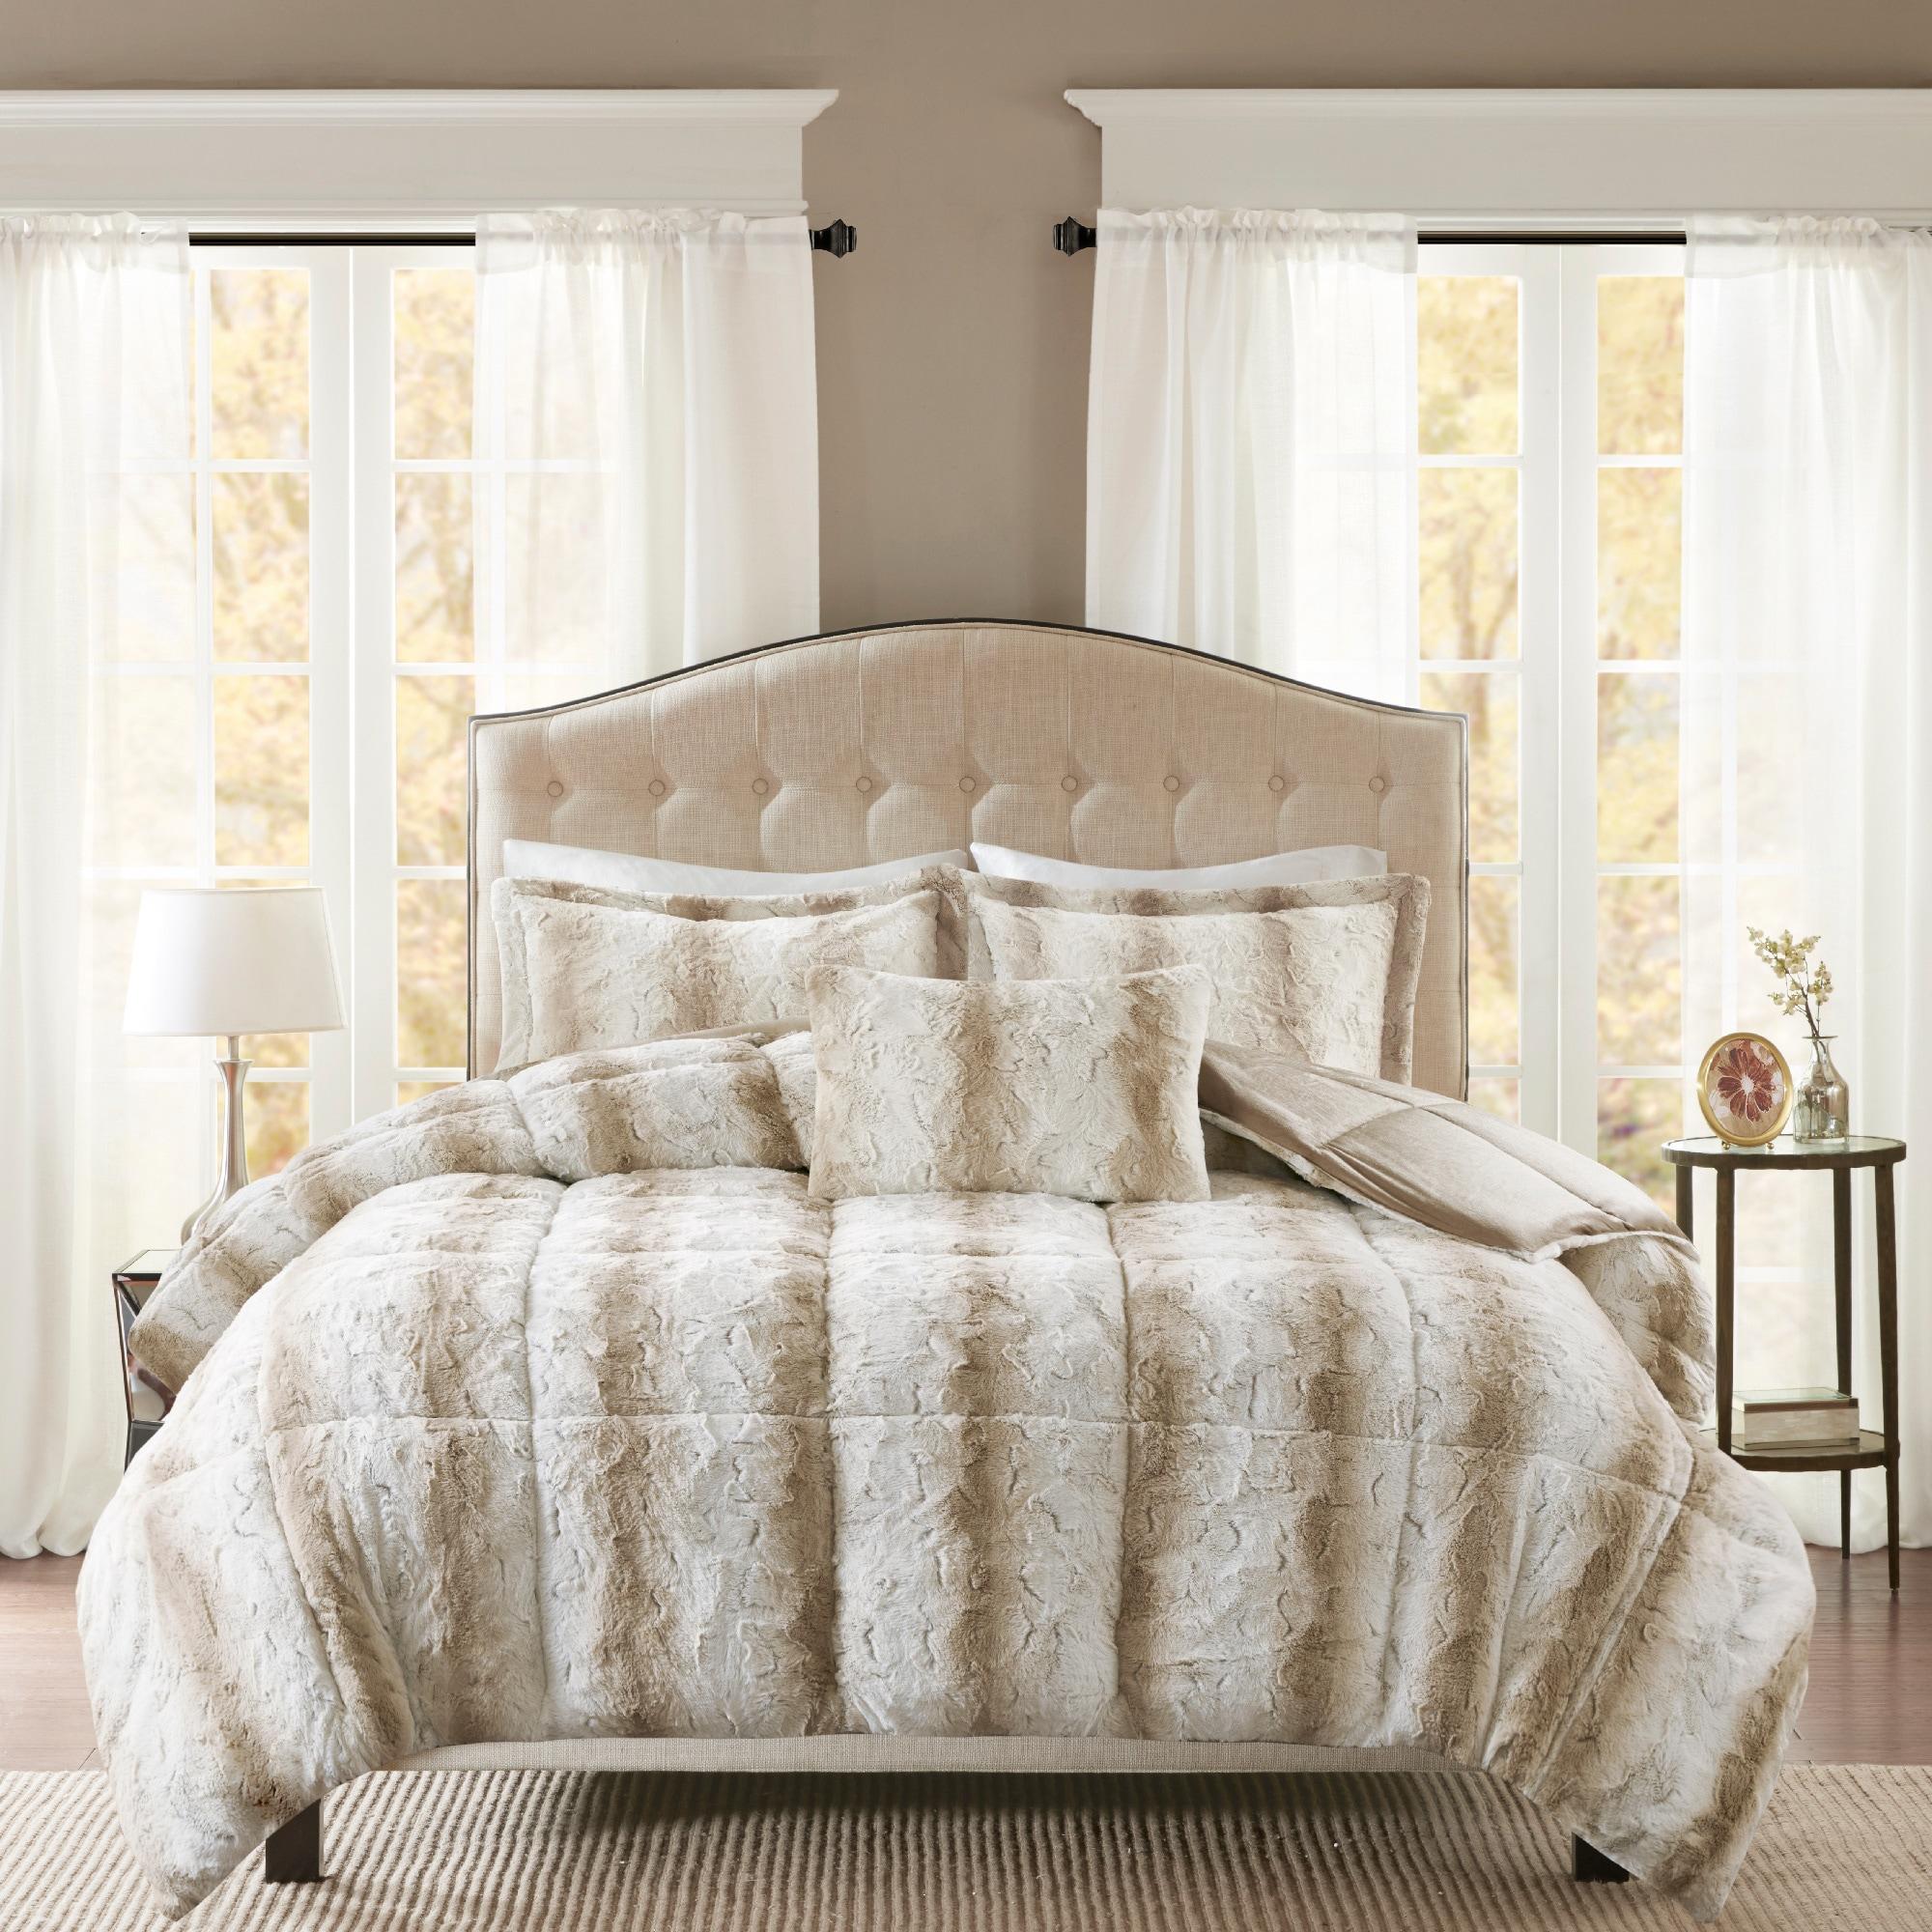 madison ivory comforter plush fur mp mini itm set park ebay side norfolkalbany norfolk ultra cs